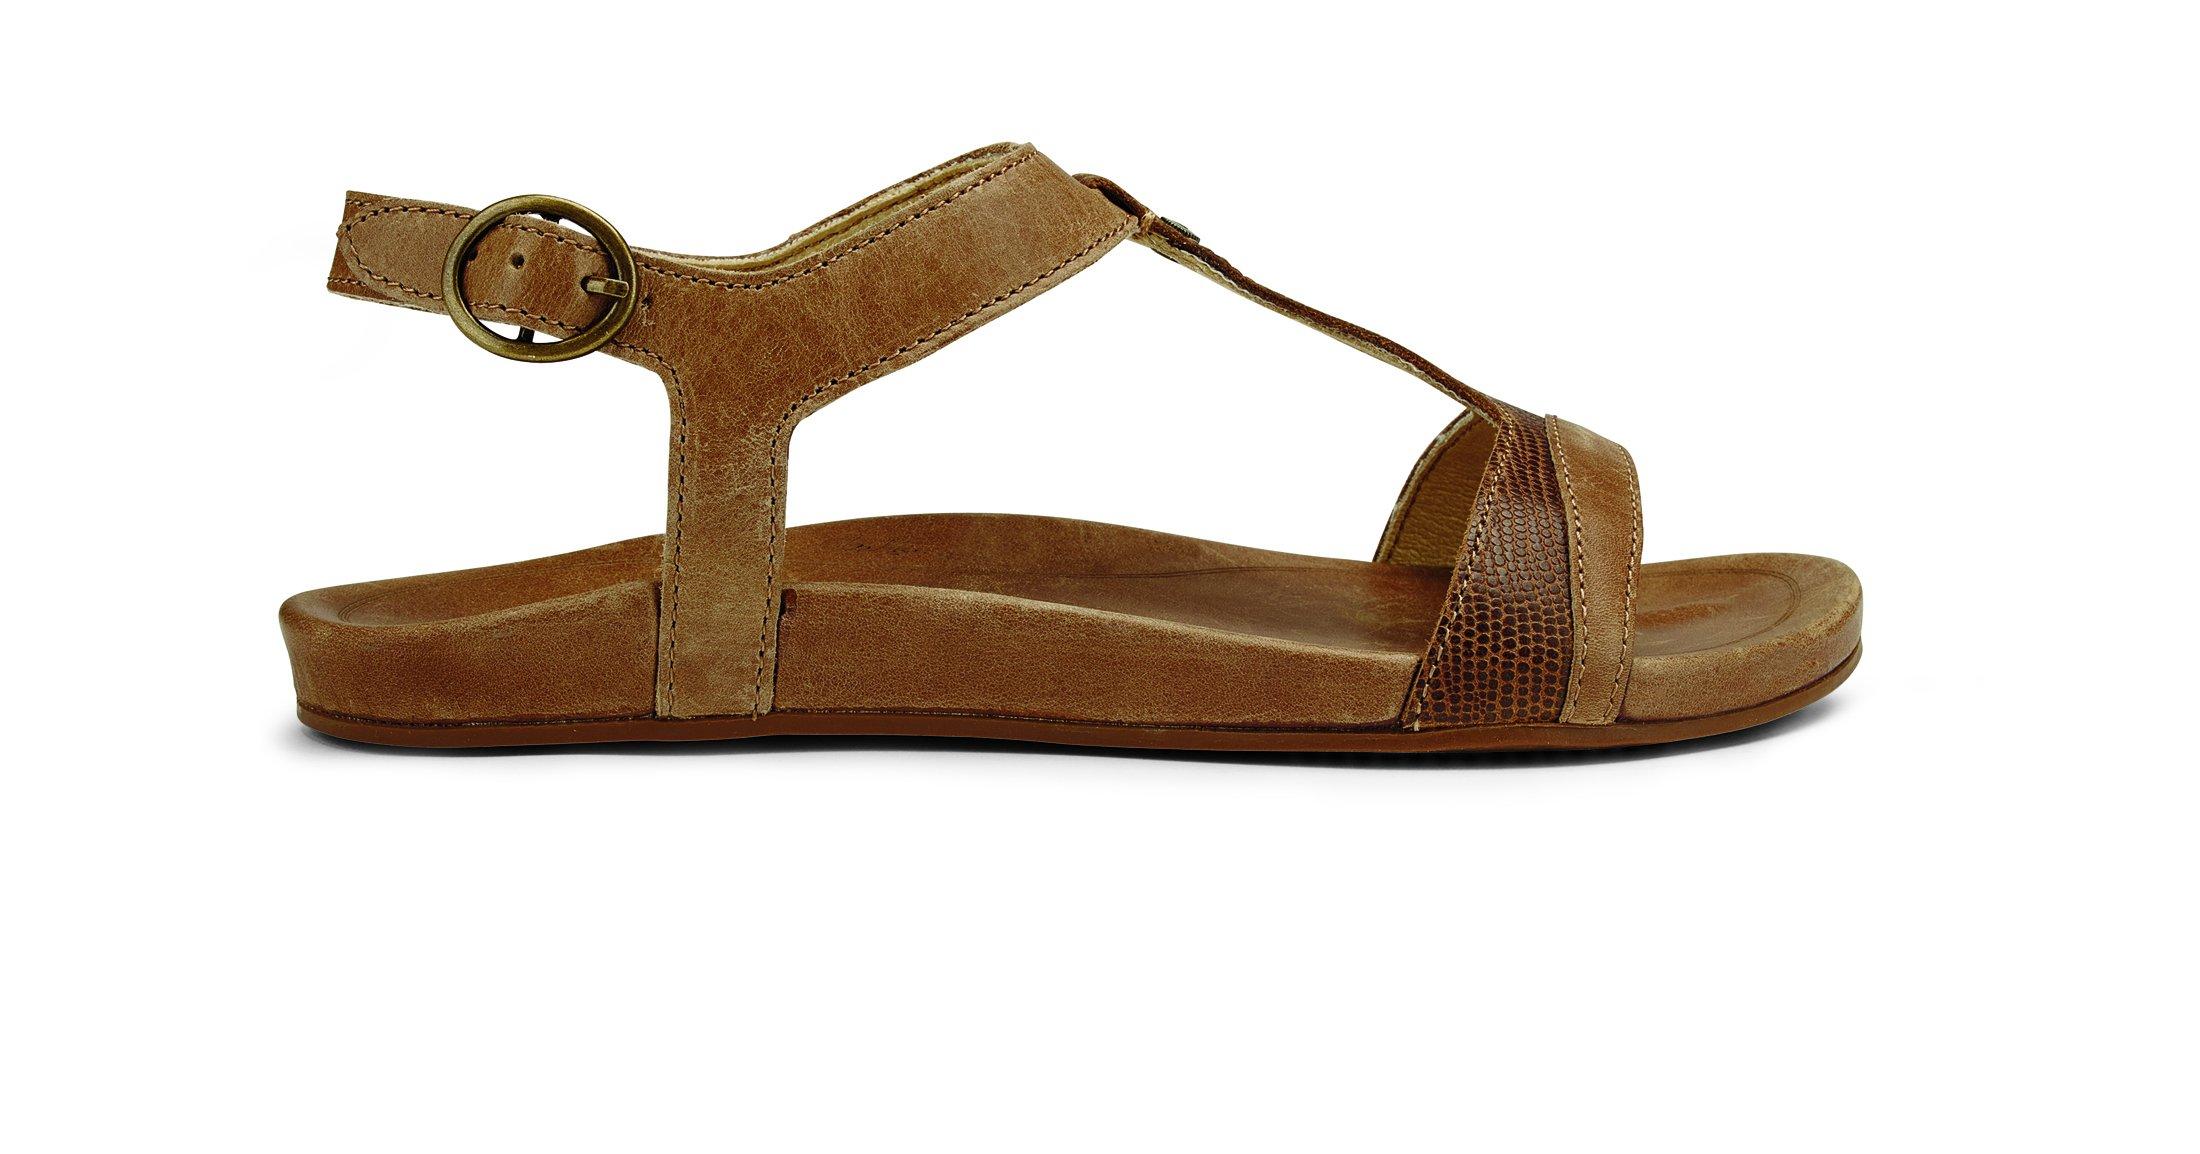 OluKai Hiona Sandal - Women's Tan 9